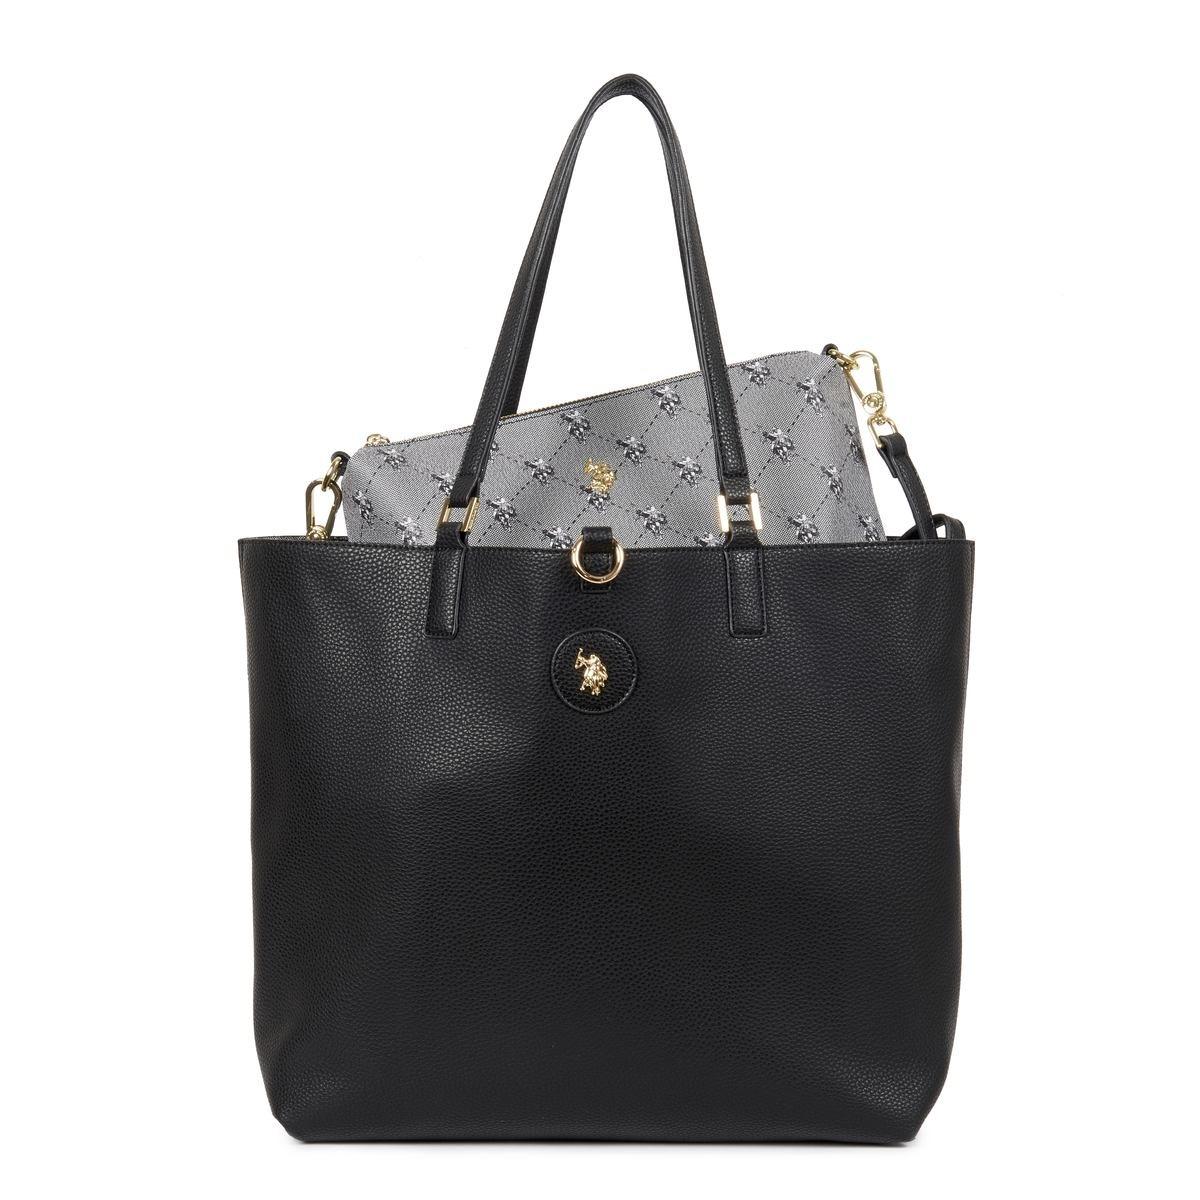 US Polo Assn. Τσάντα χειρός 3in1 34x14x32cm Malibu Black